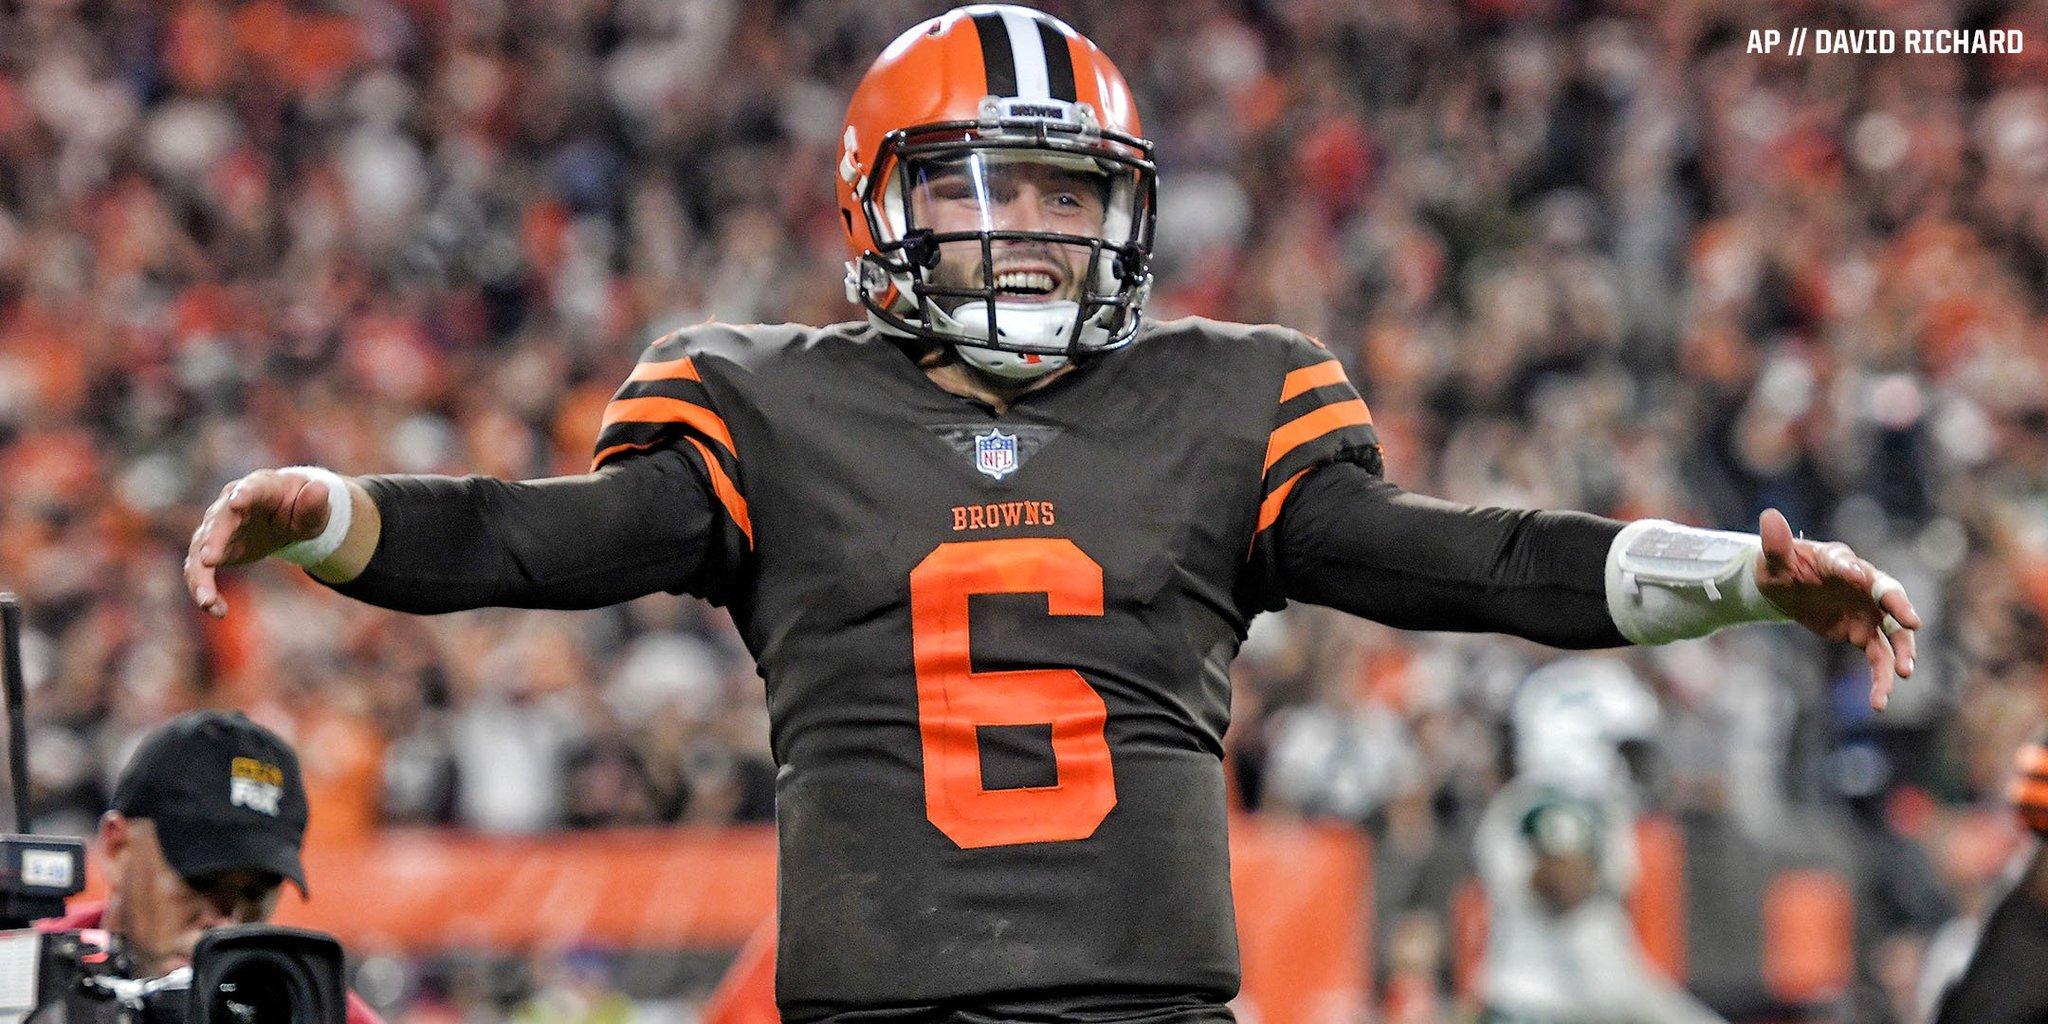 Baker Mayfield rallies Browns to 1st win since 2016  Game Recap » https://t.co/FQAdCqa3u6 https://t.co/qxaLvSBdL3